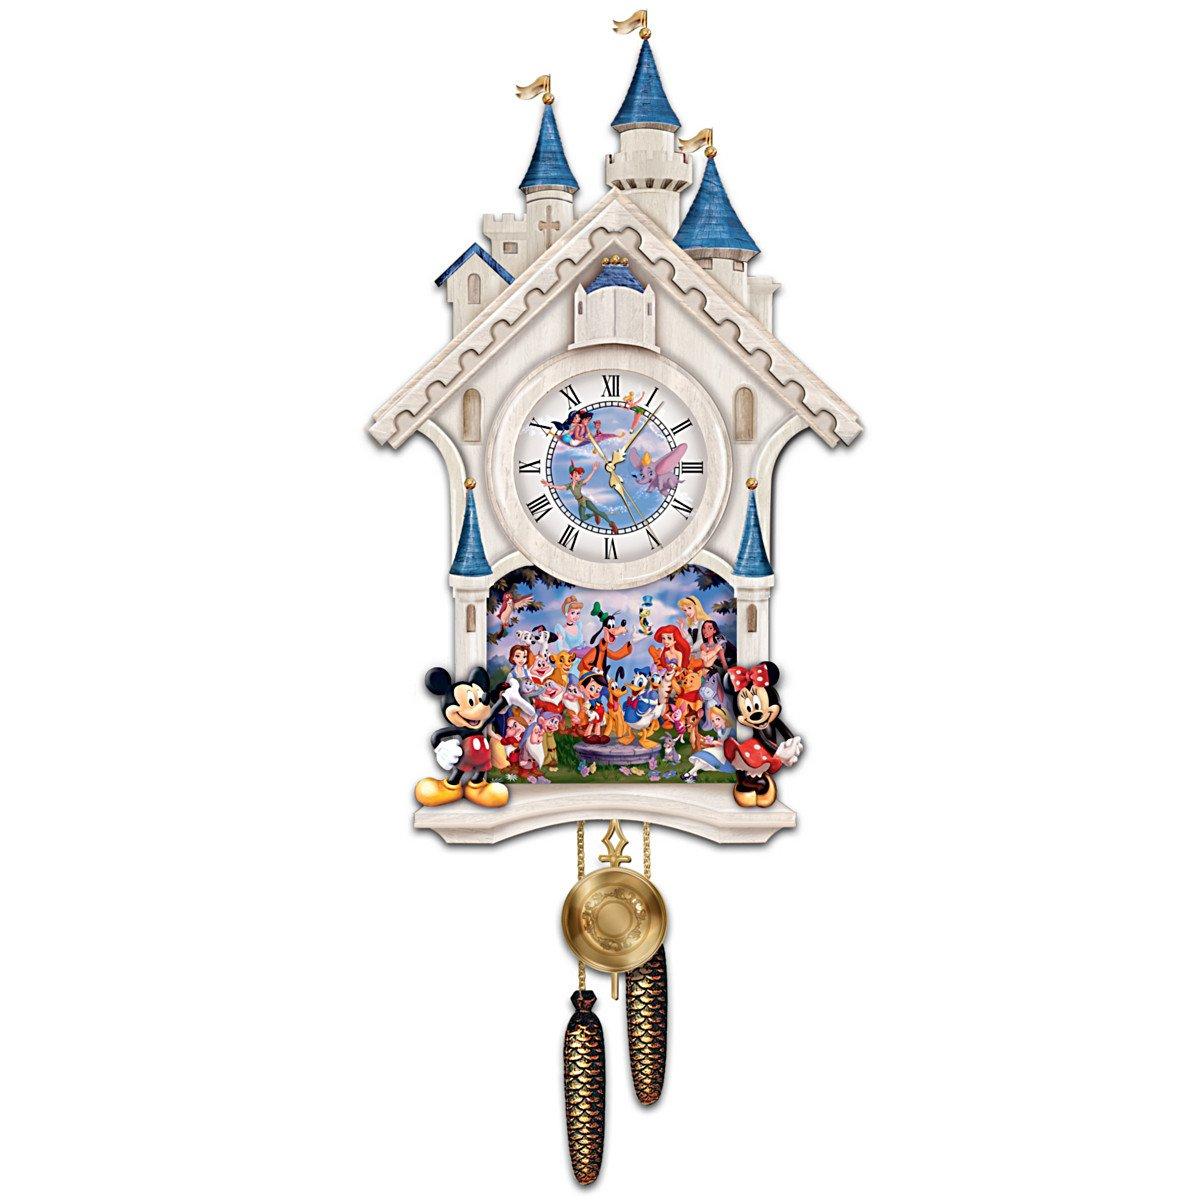 Disney Character Cuckoo Clock: Happiest Of Times by the Bradford Exchange by The Bradford Exchange